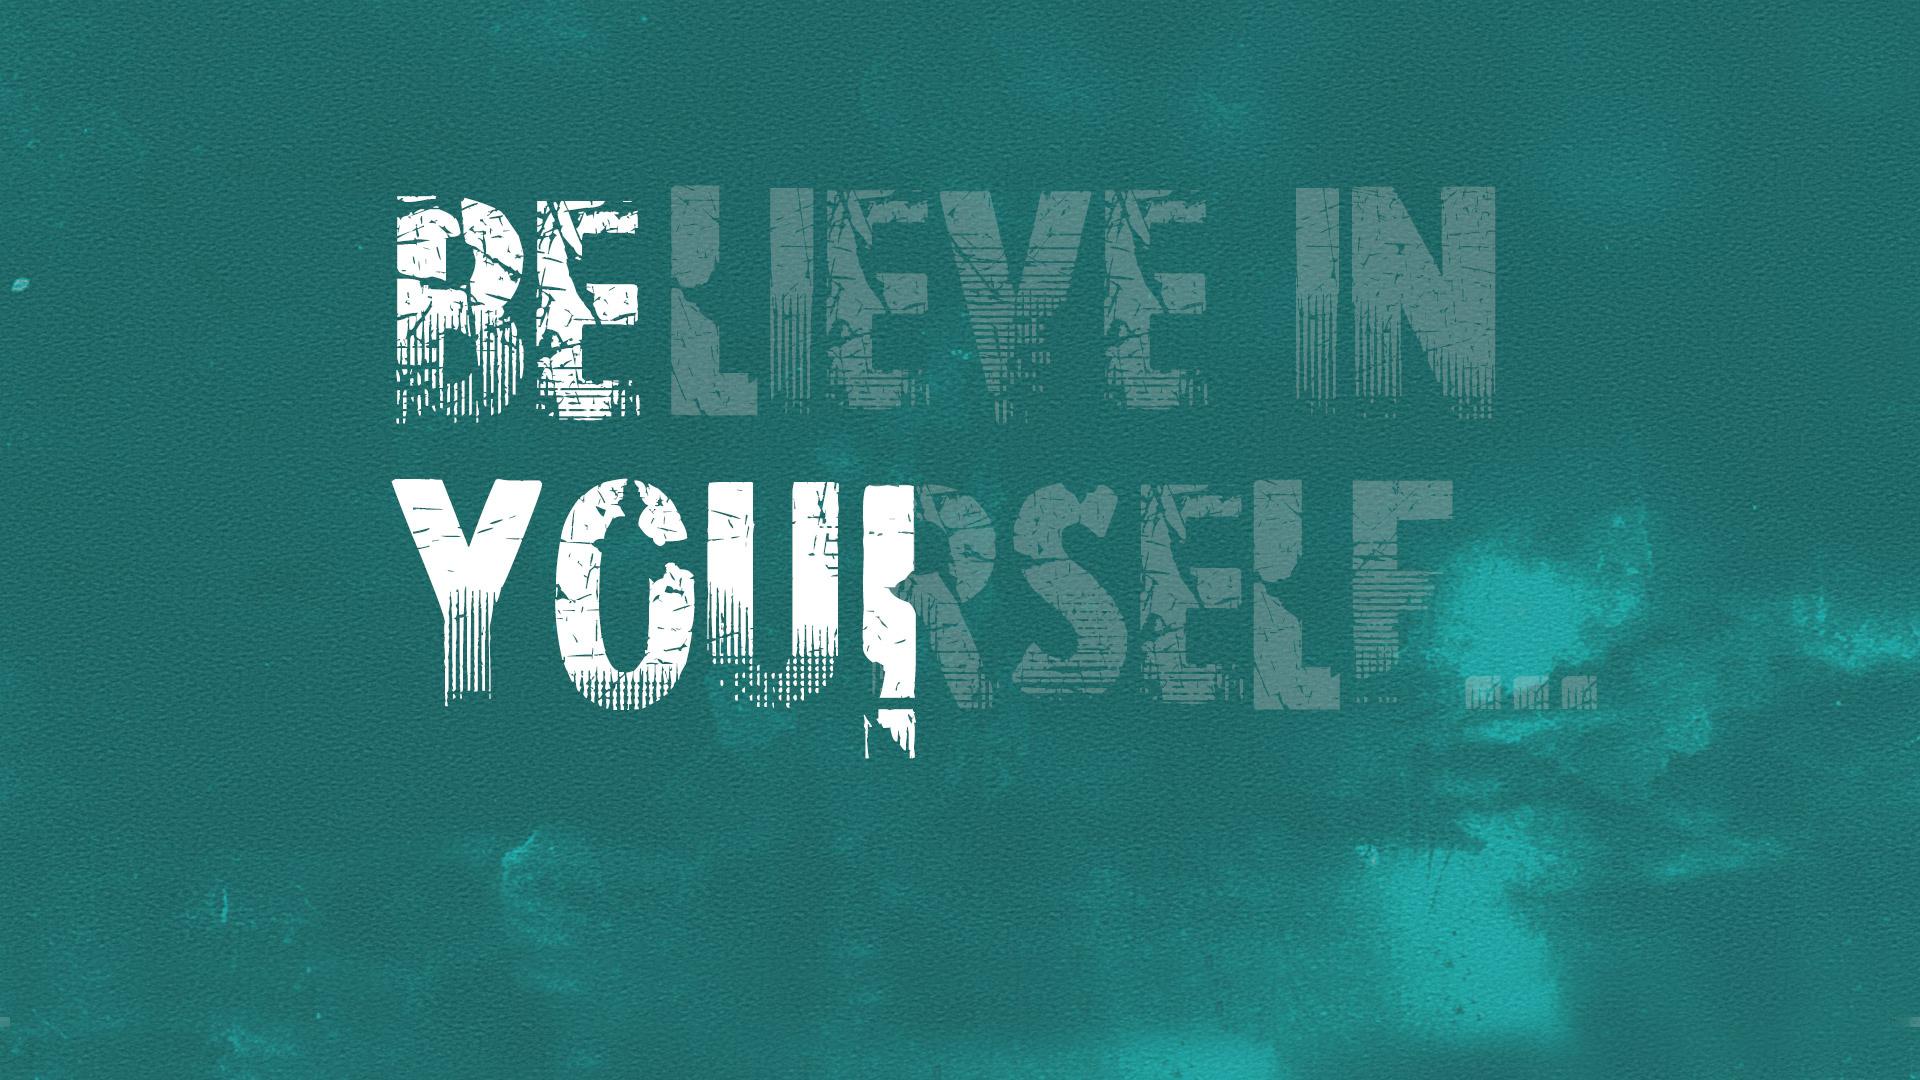 Motivational Wallpaper Believe in Yourself